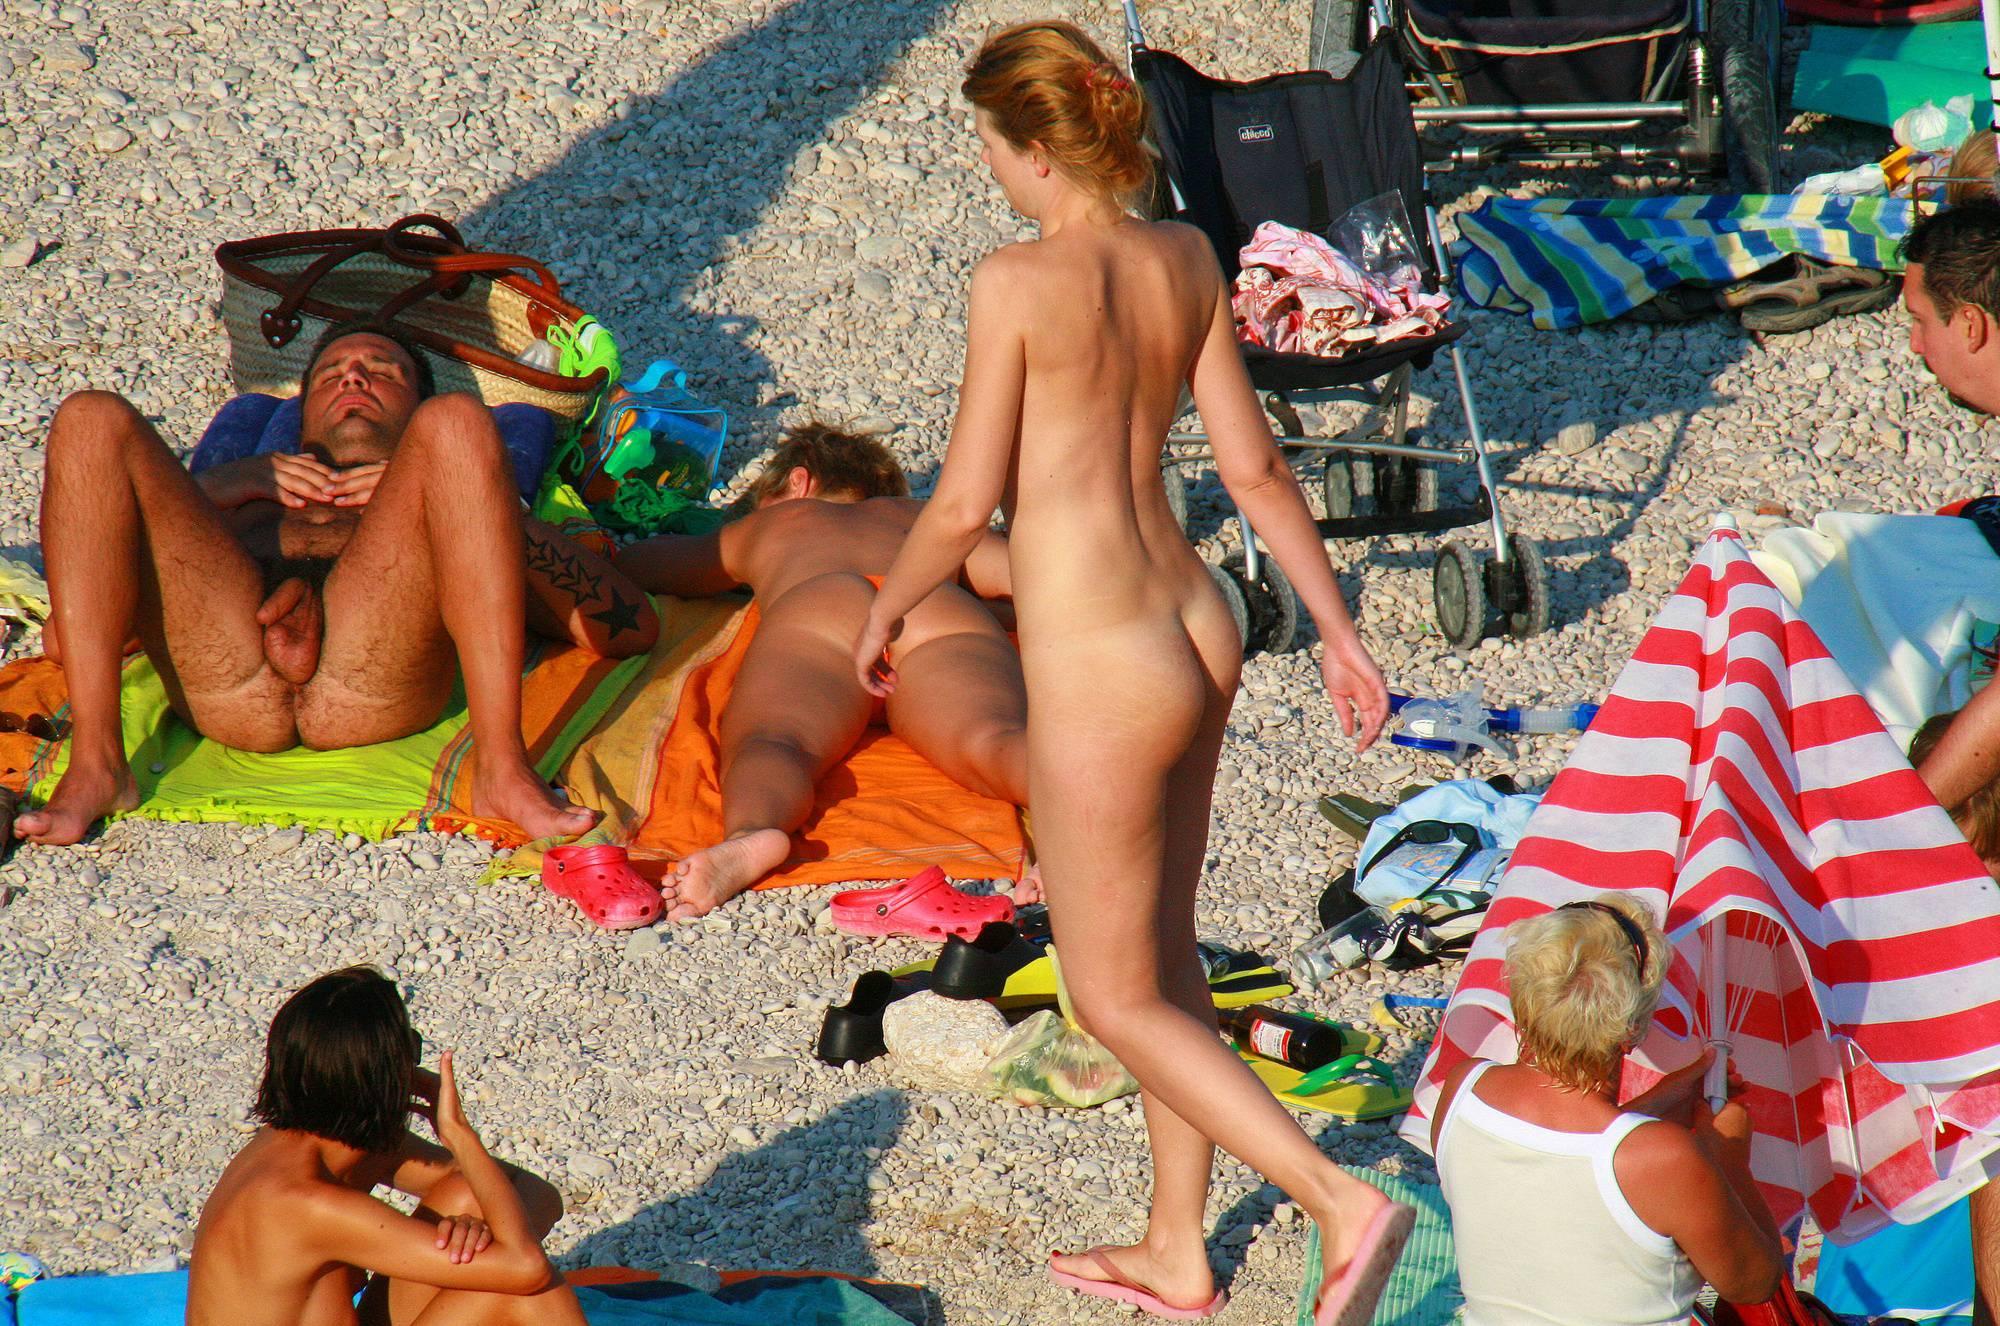 Pure Nudism-Ula FKK Beach Field Pass - 3